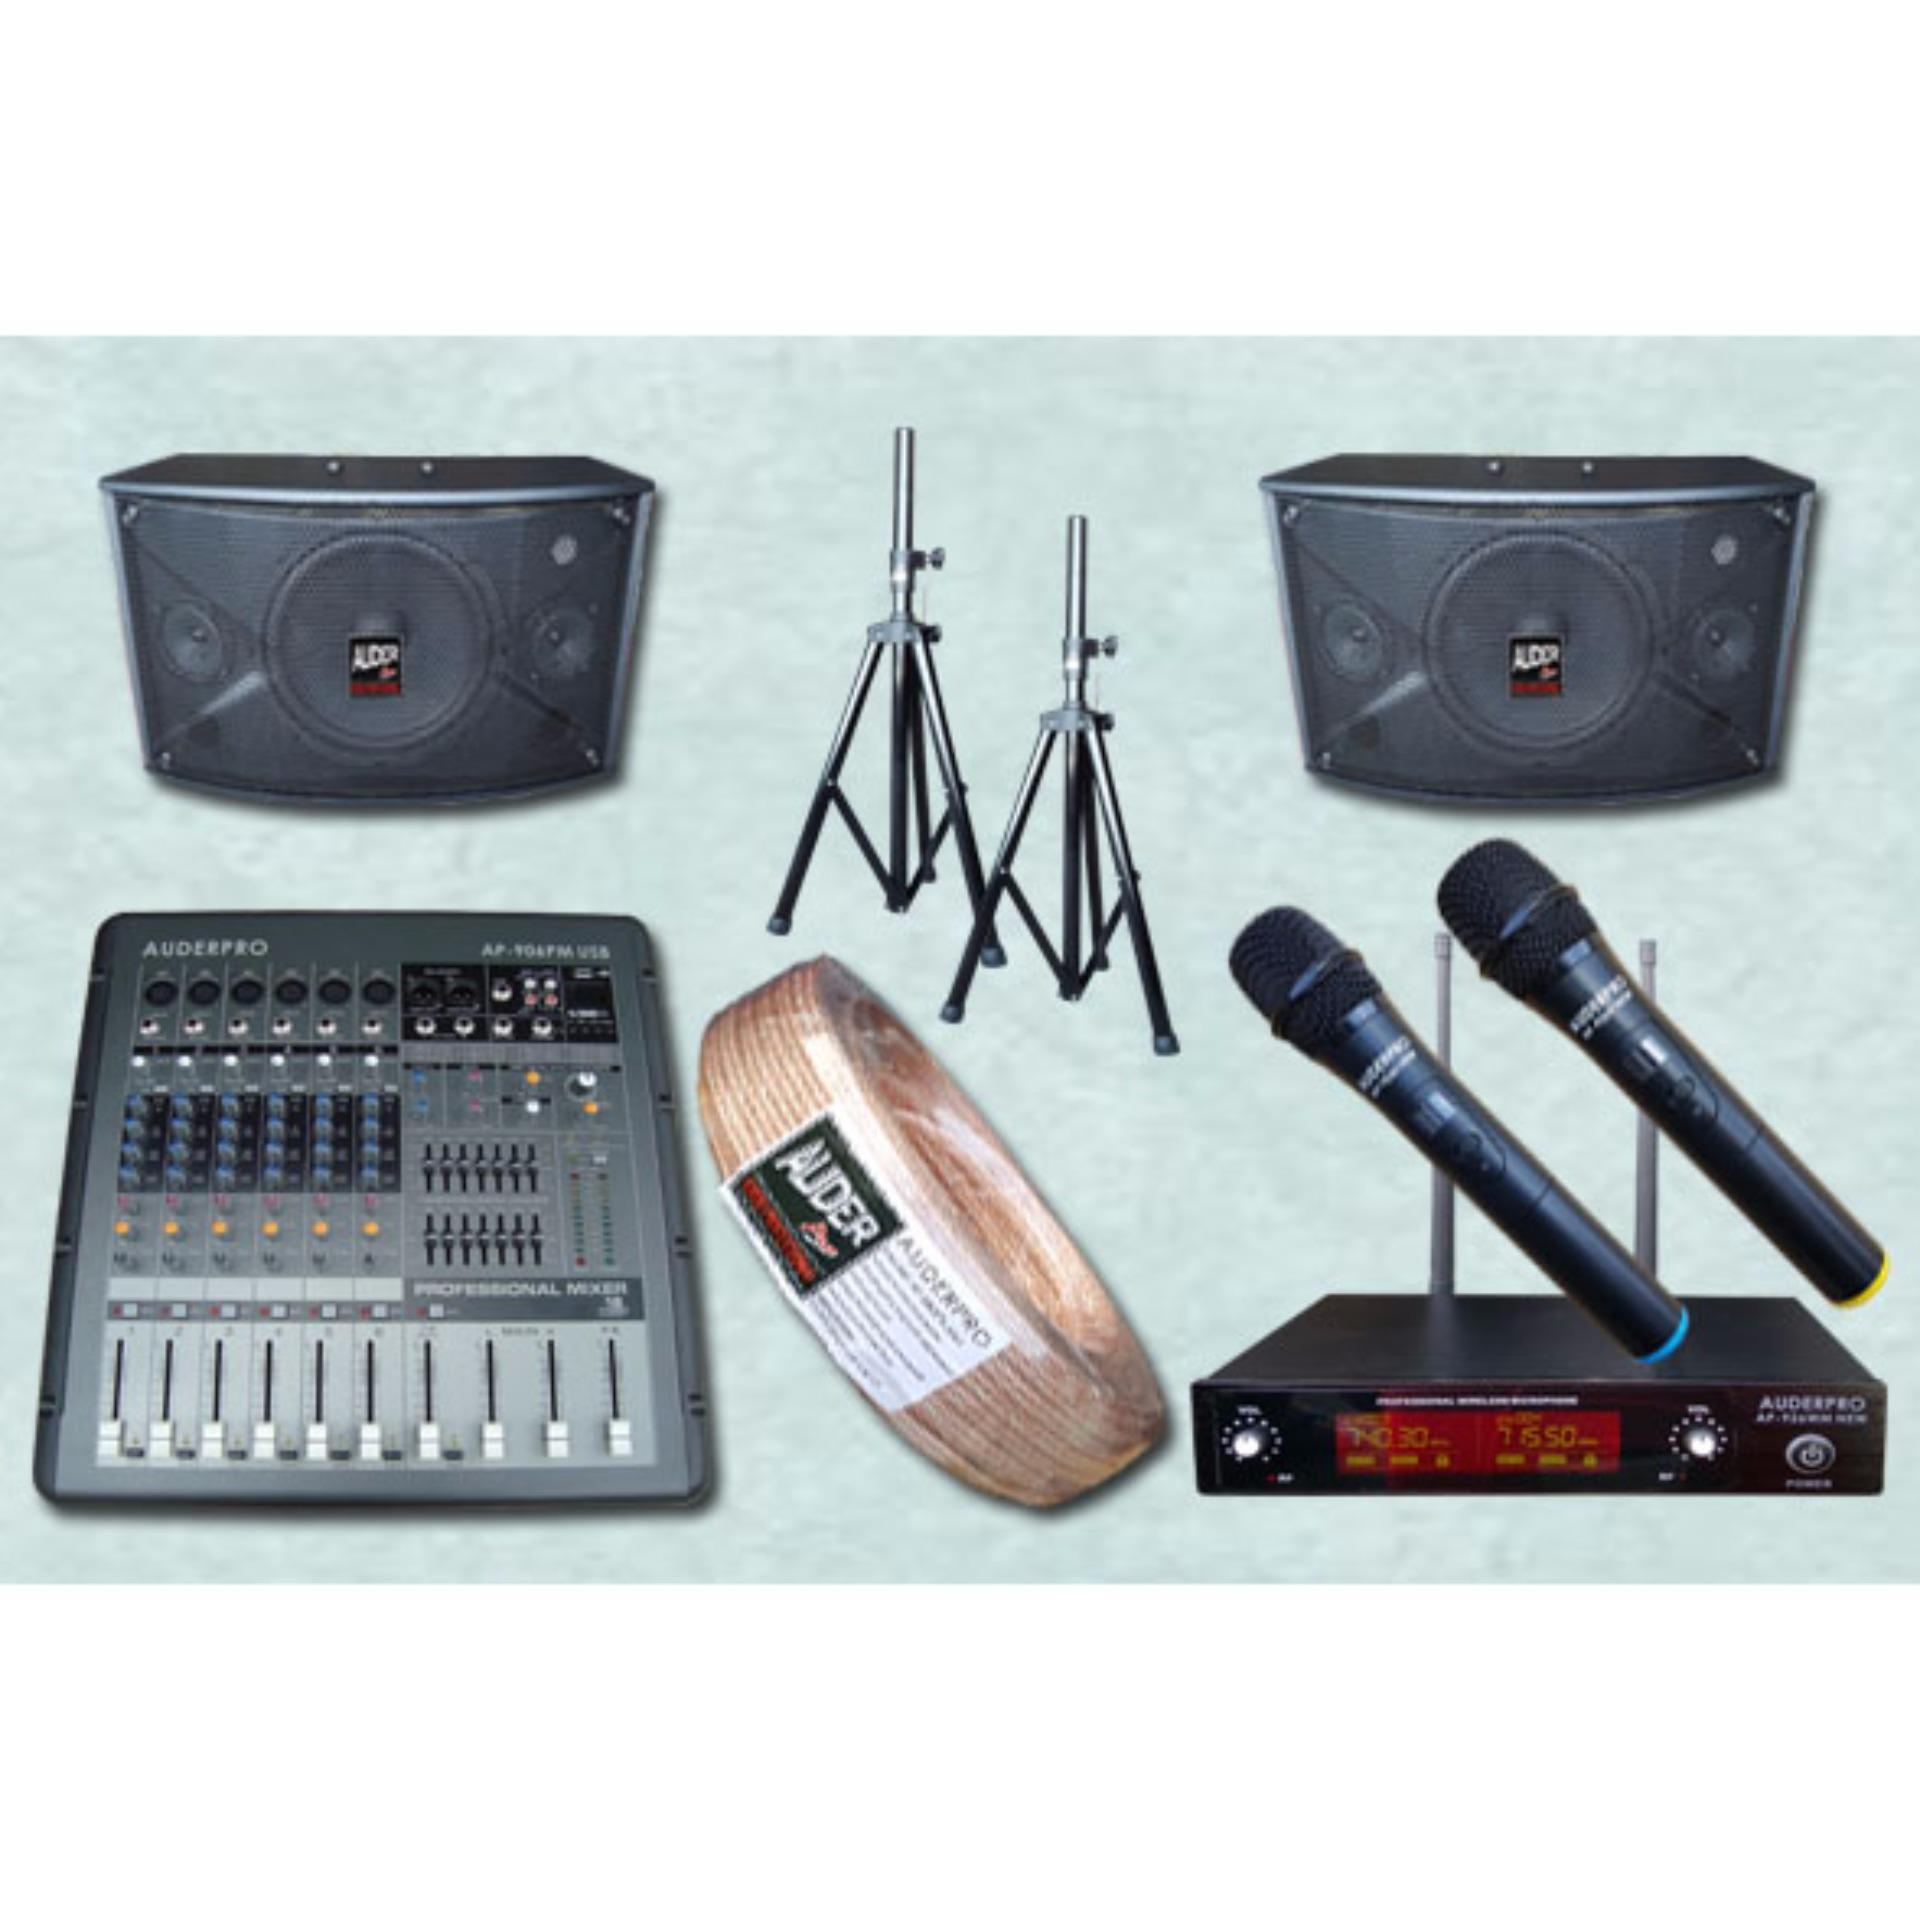 Review Paket Sound System Karaoke Meeting Kecil 7 Auderpro 8Inc Rekam Power Mixer Terbaru